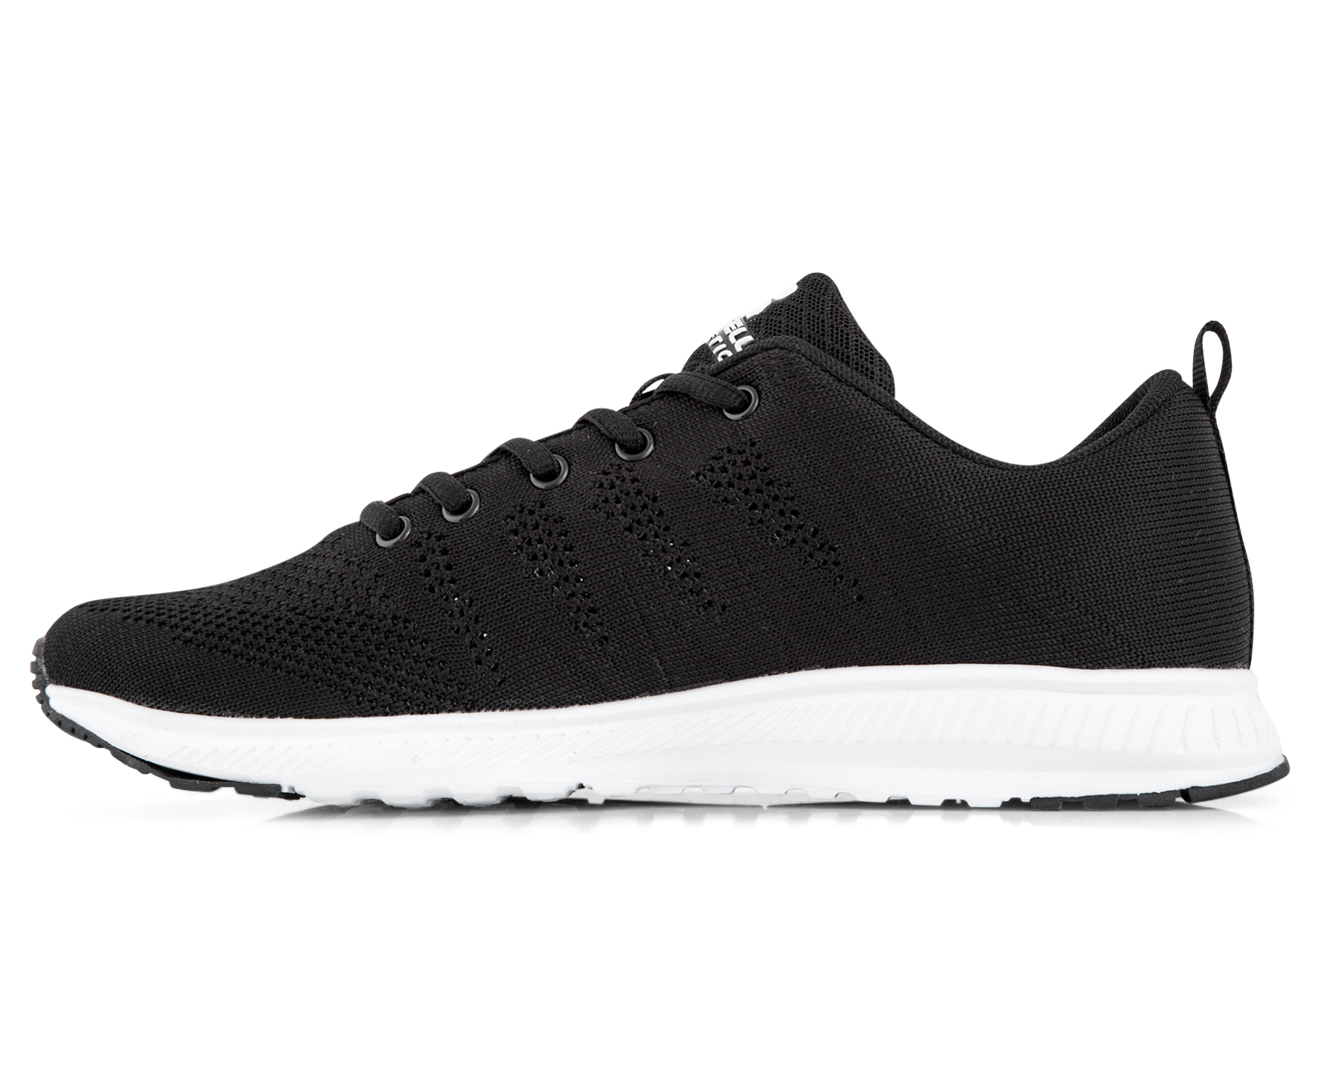 Russell Athletic Womenu0026#39;s Magni Training Shoe - Black/White ...